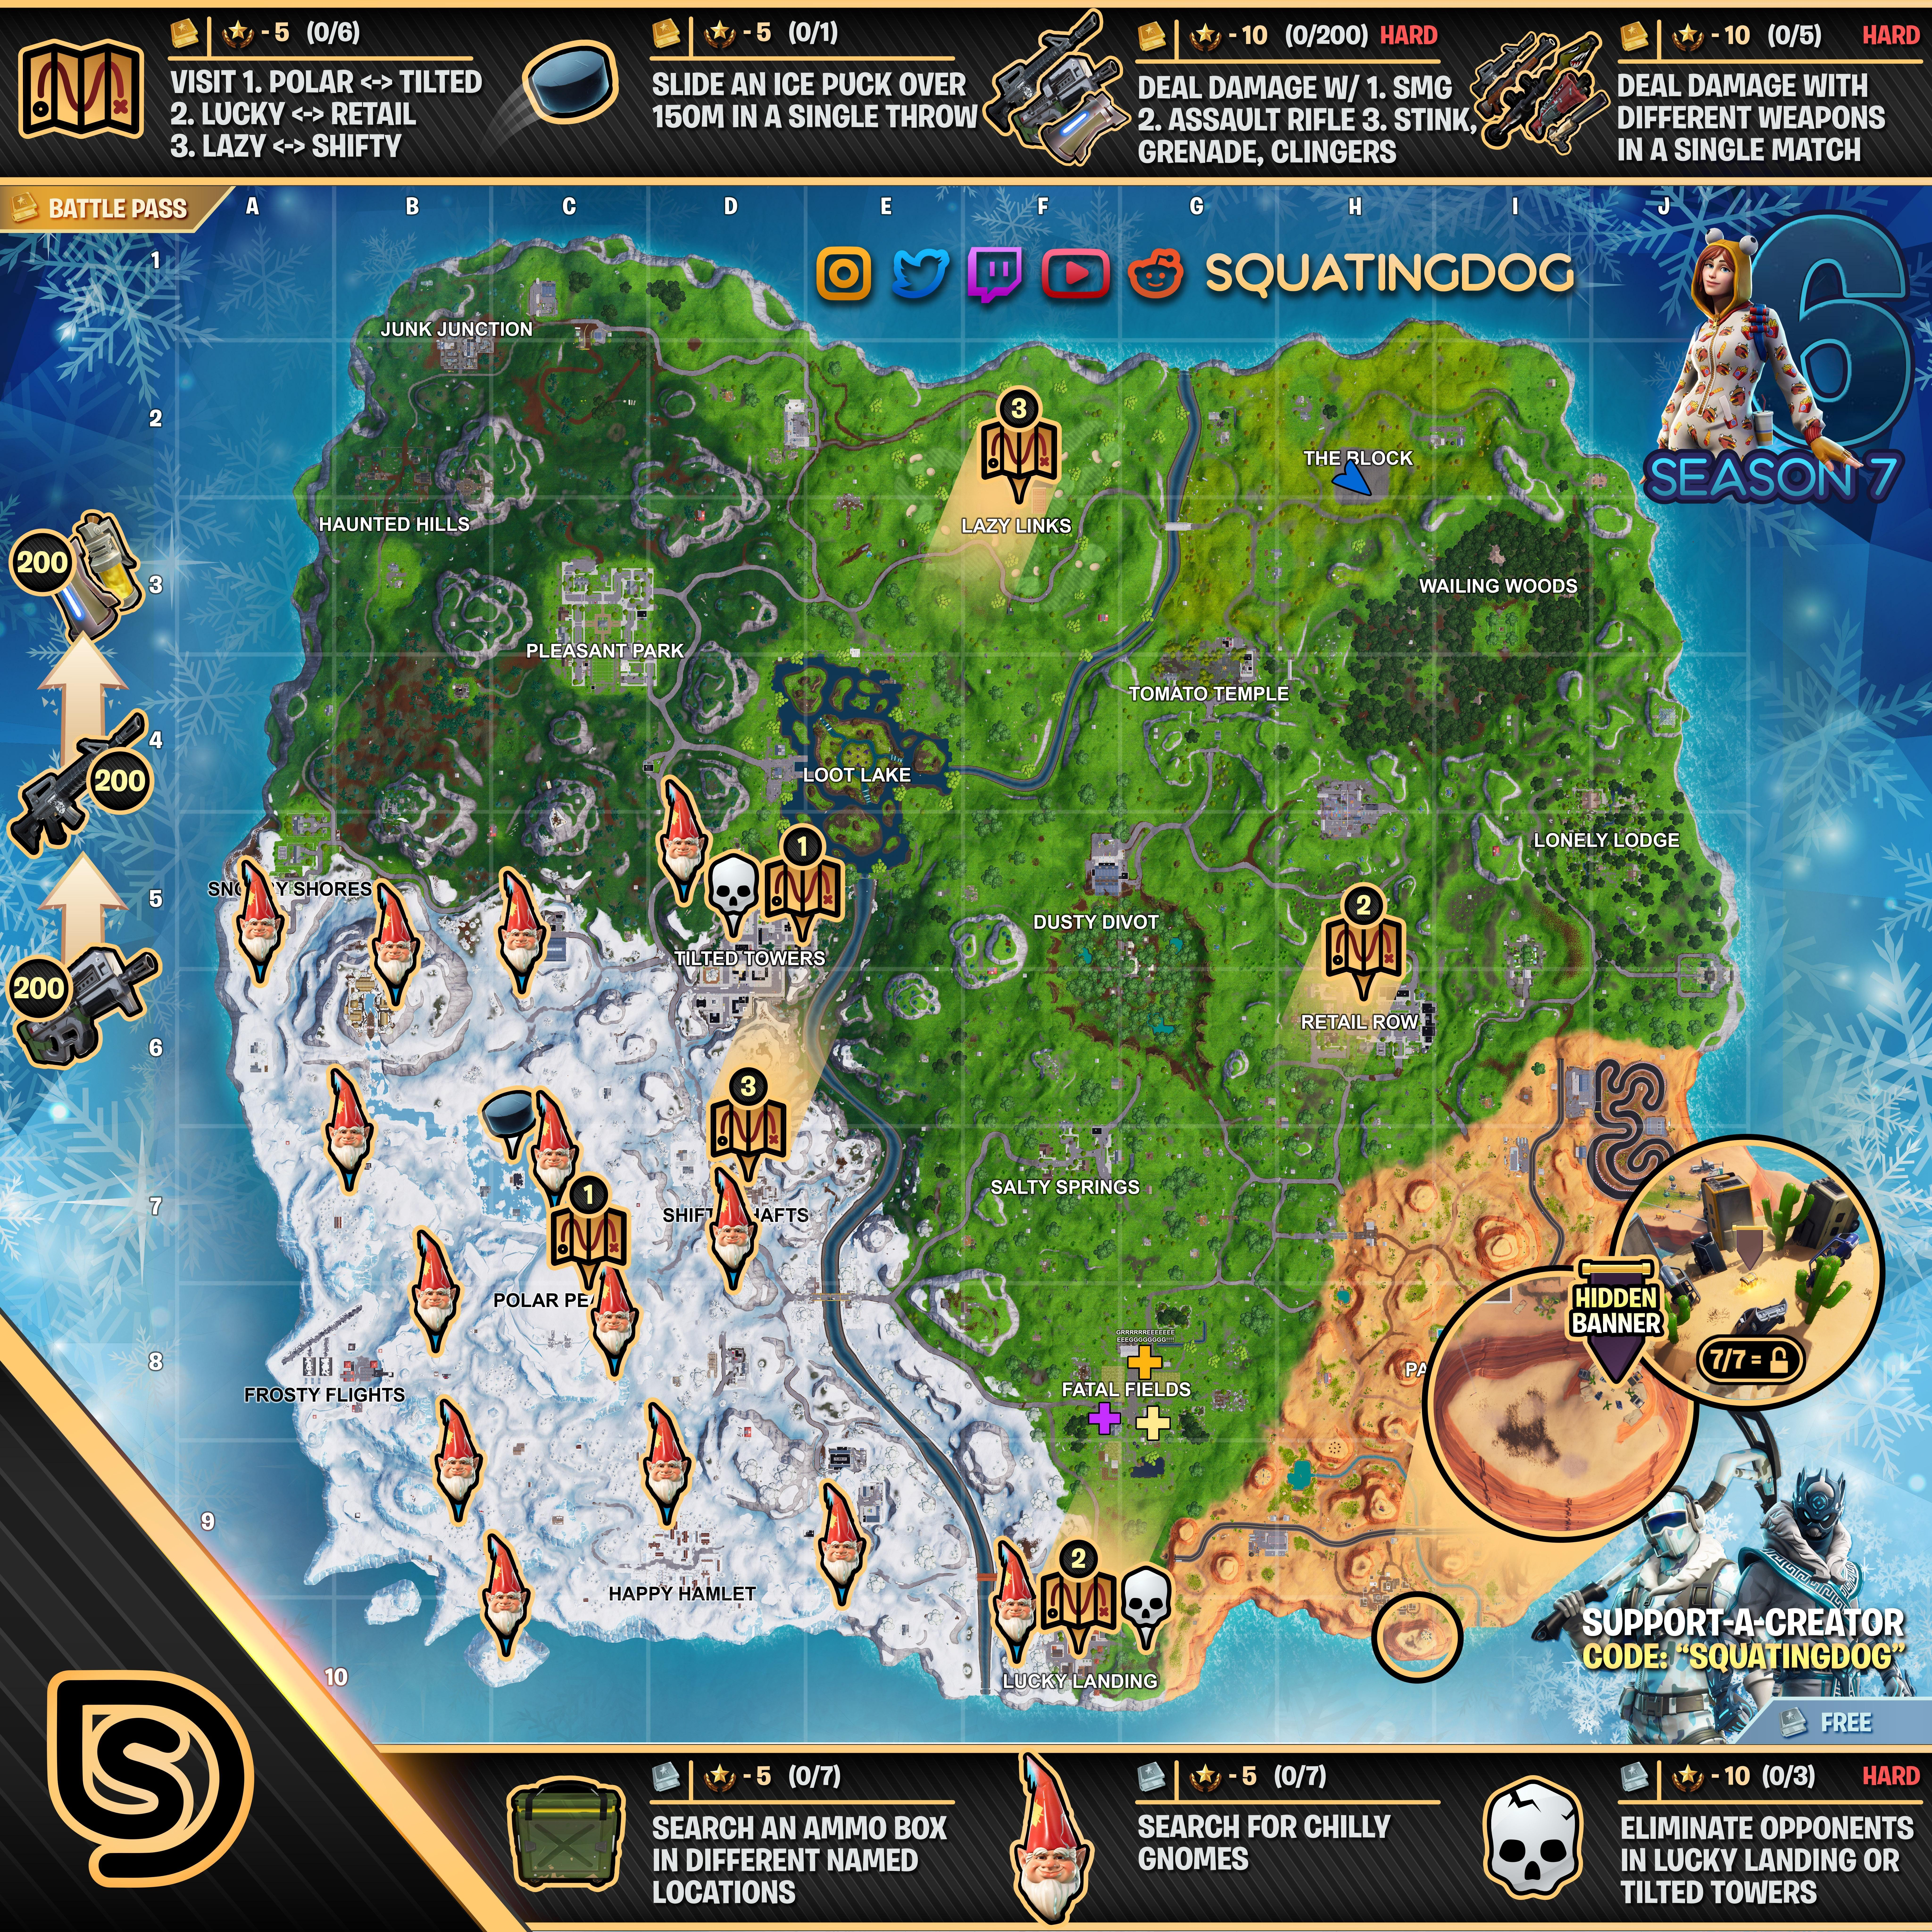 Season 7 Week 6 Challenges All Inclusive Cheat Sheet Via R Fortnitebr Fortnite Season 7 Seasons Epic games has decided to make fortnite: pinterest